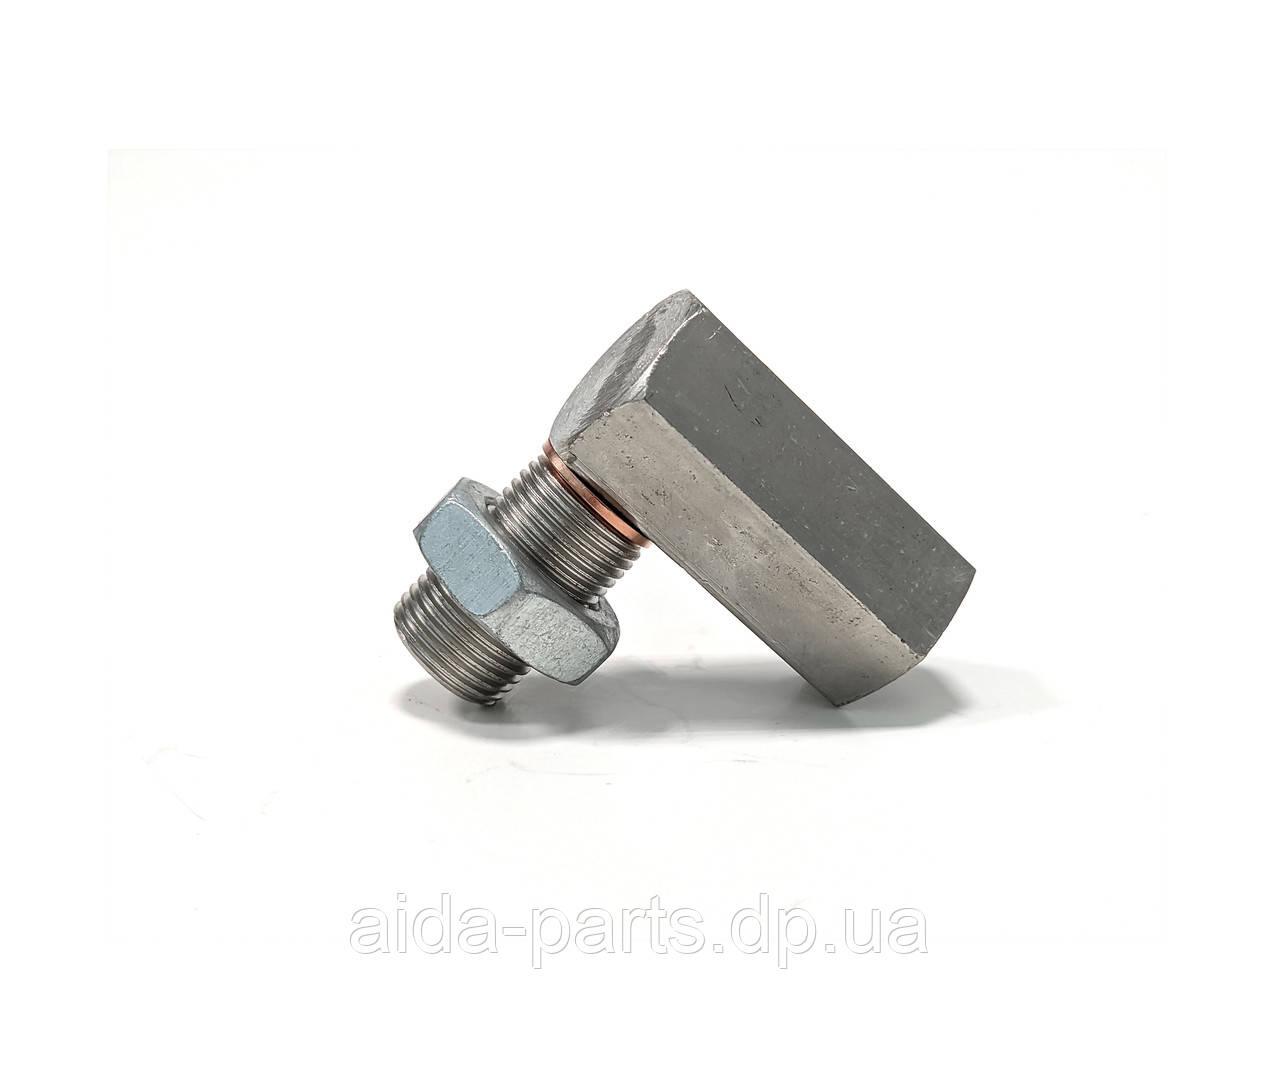 Обманка Лямбда зонда (эмулятор катализатора) Евро 2, 3  угловая MC104 CBD